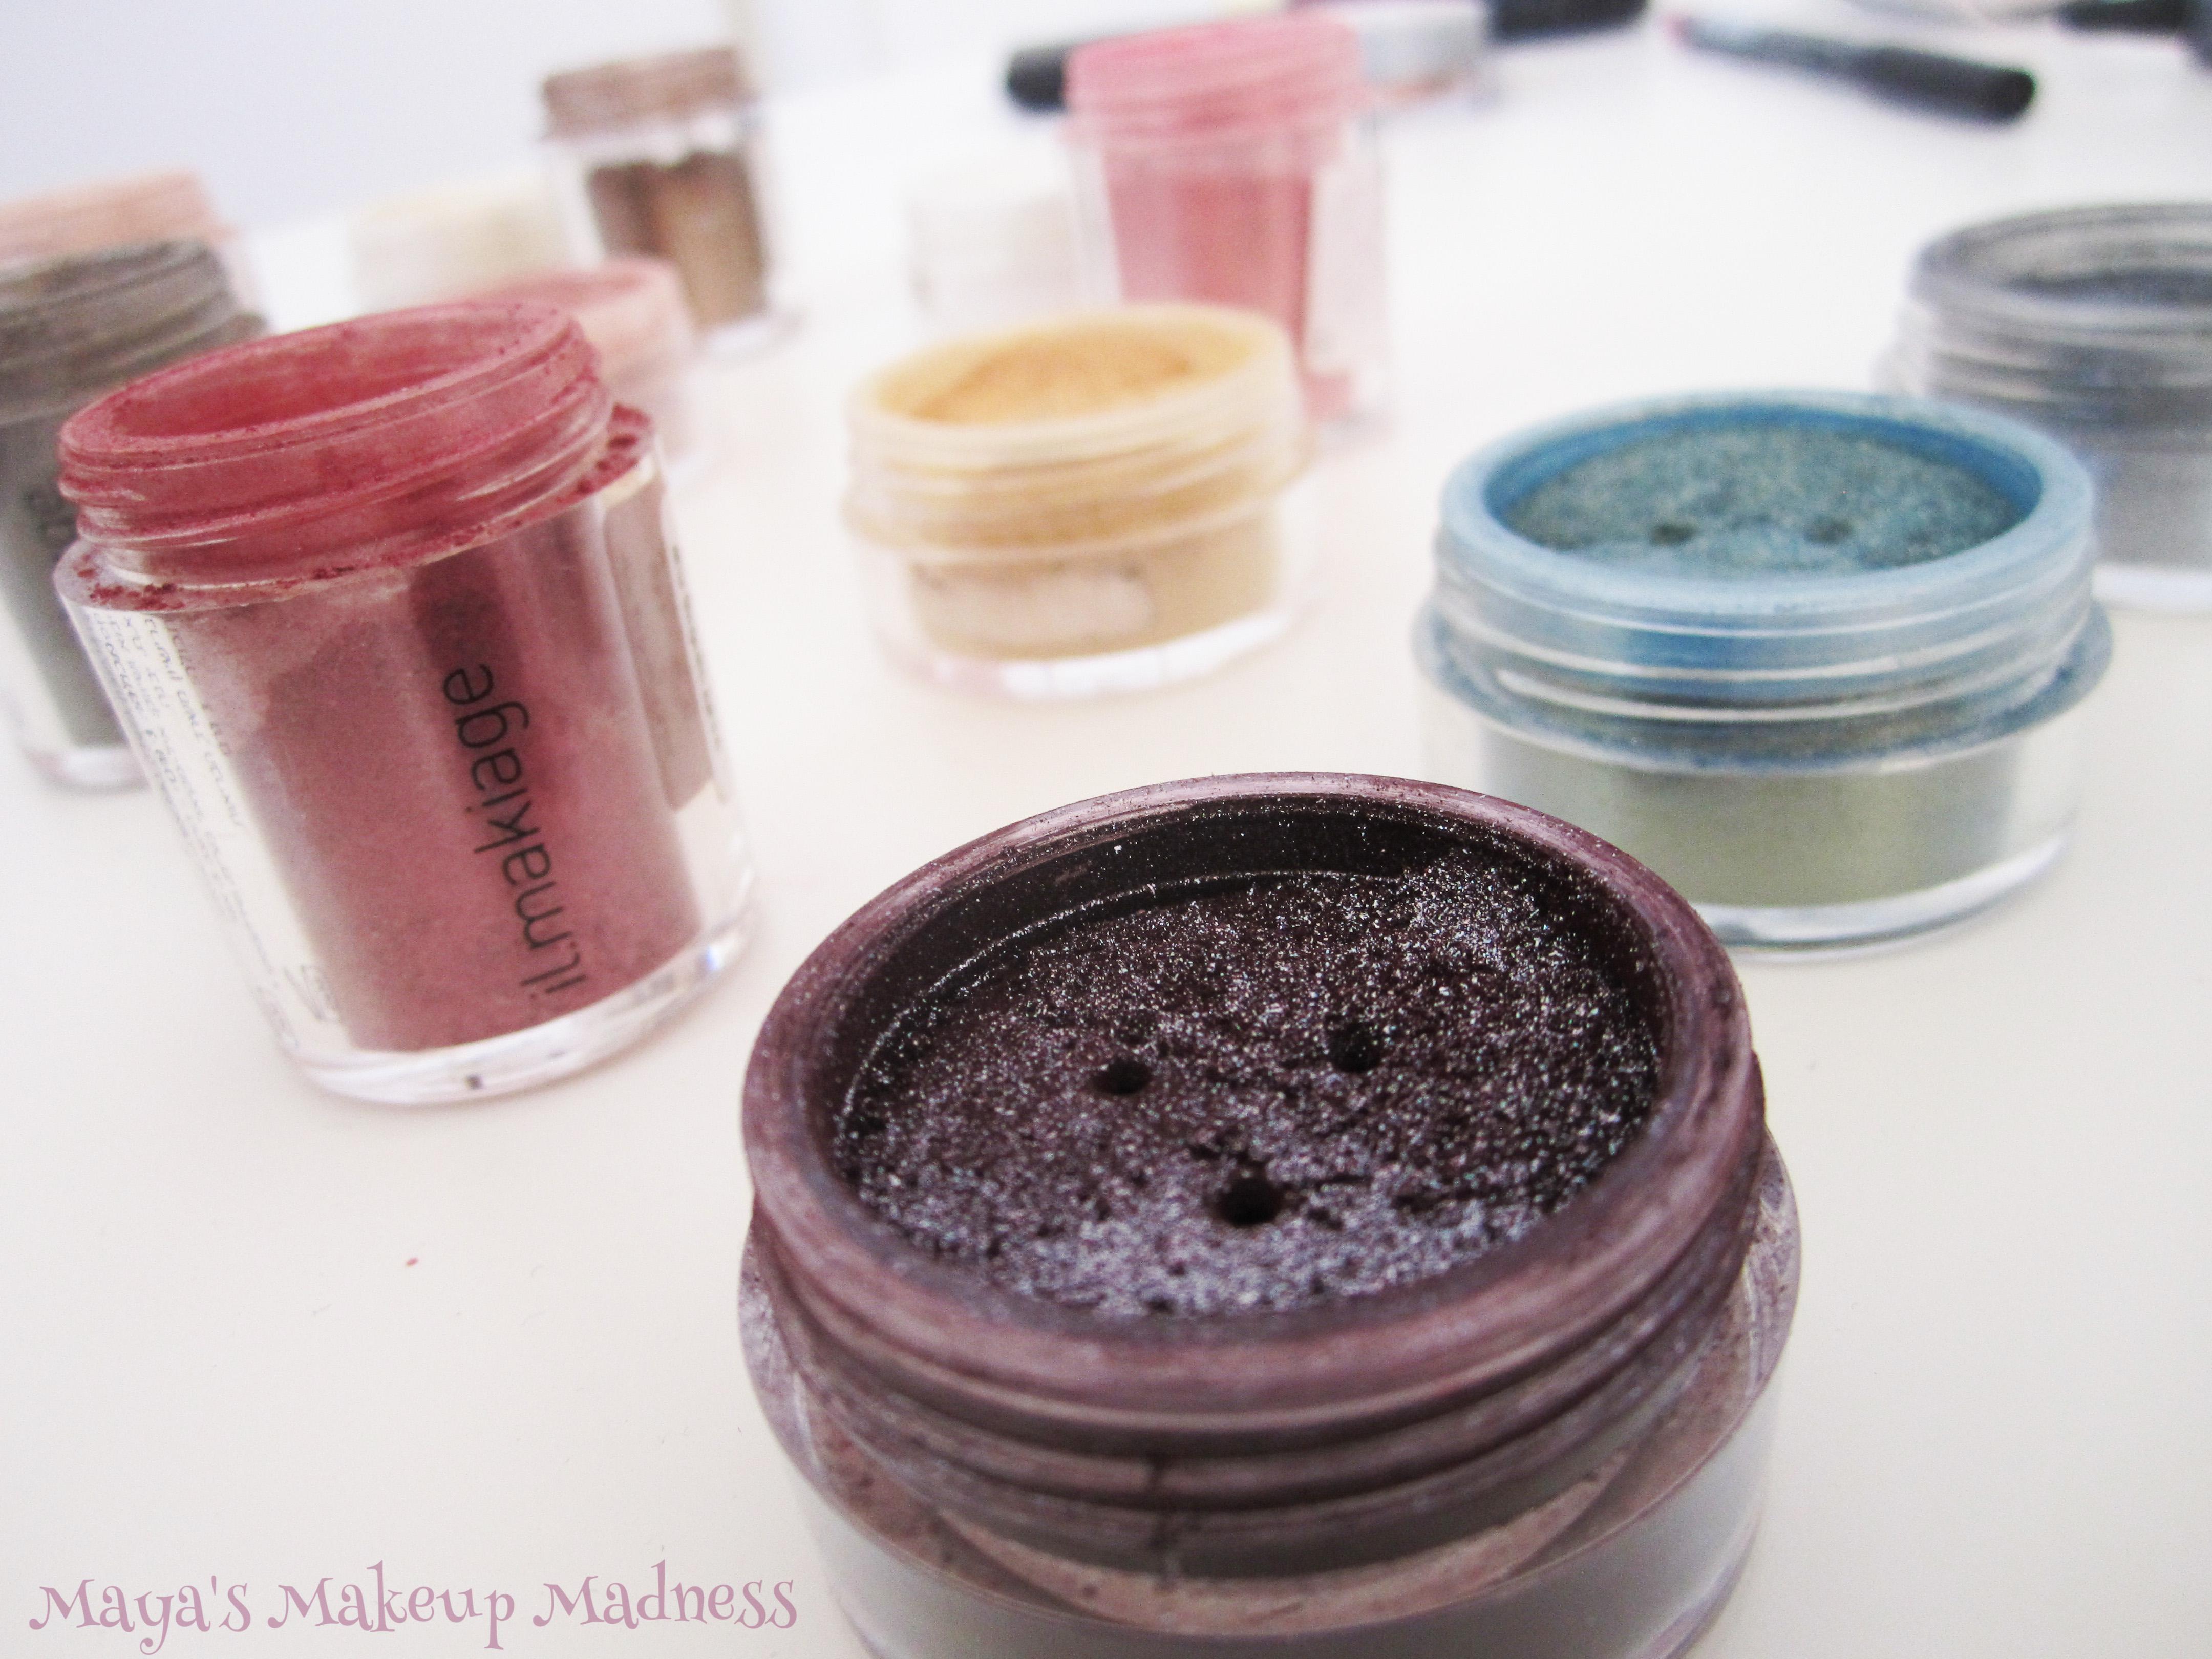 Pushed Aside Products – Maya's Makeup Madness